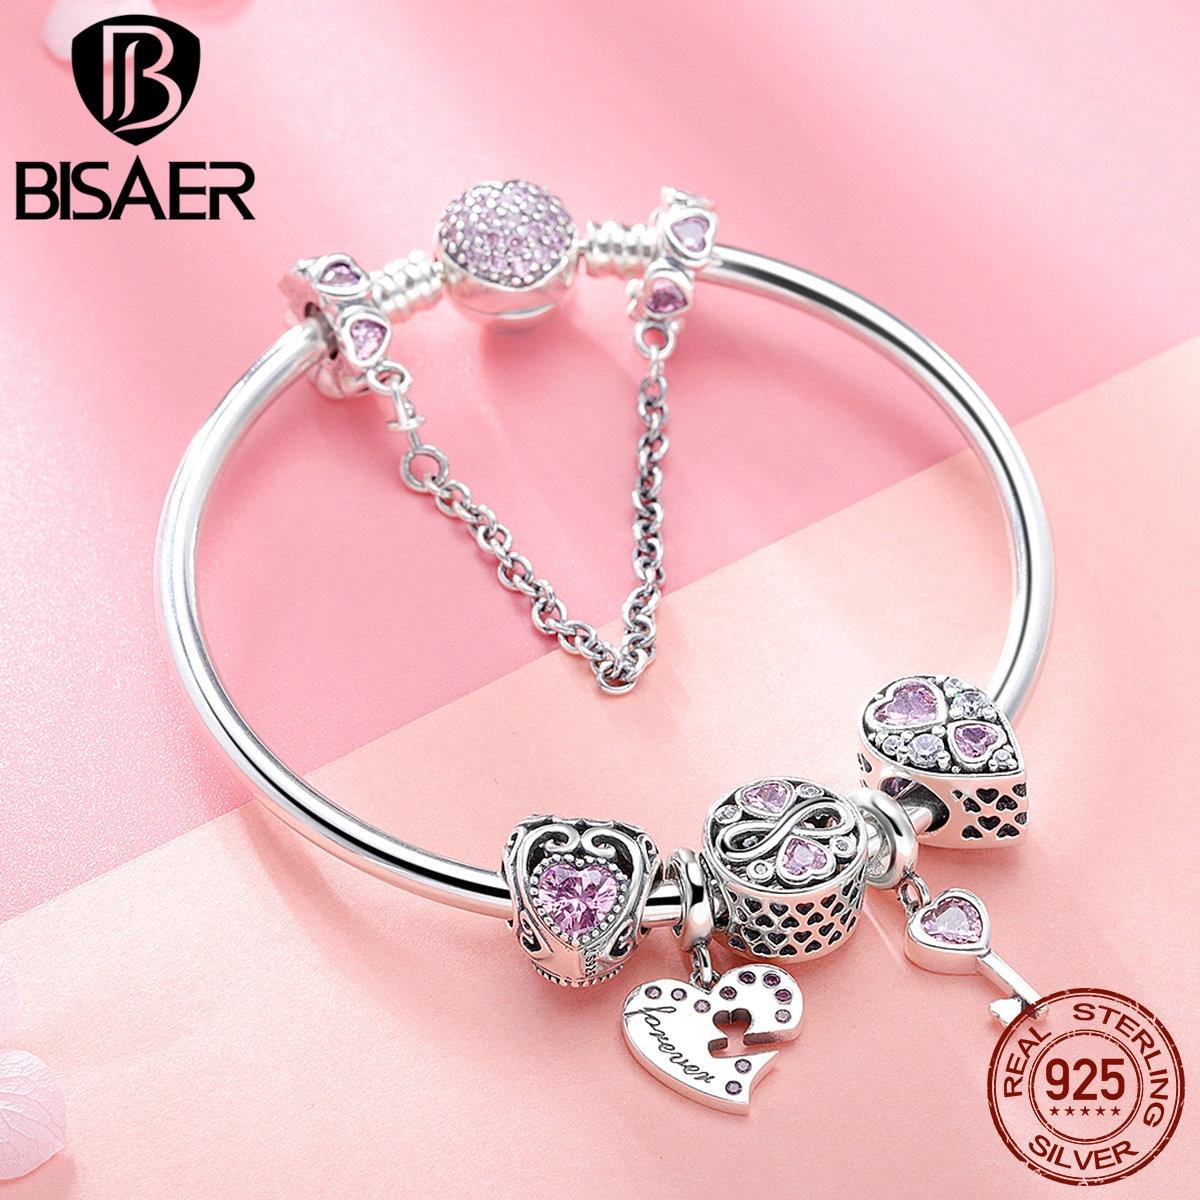 BISAER 7Pcs 925 Sterling Silver Heart Key And Locket Heart Pendant Brand Charm Bracelet For Women